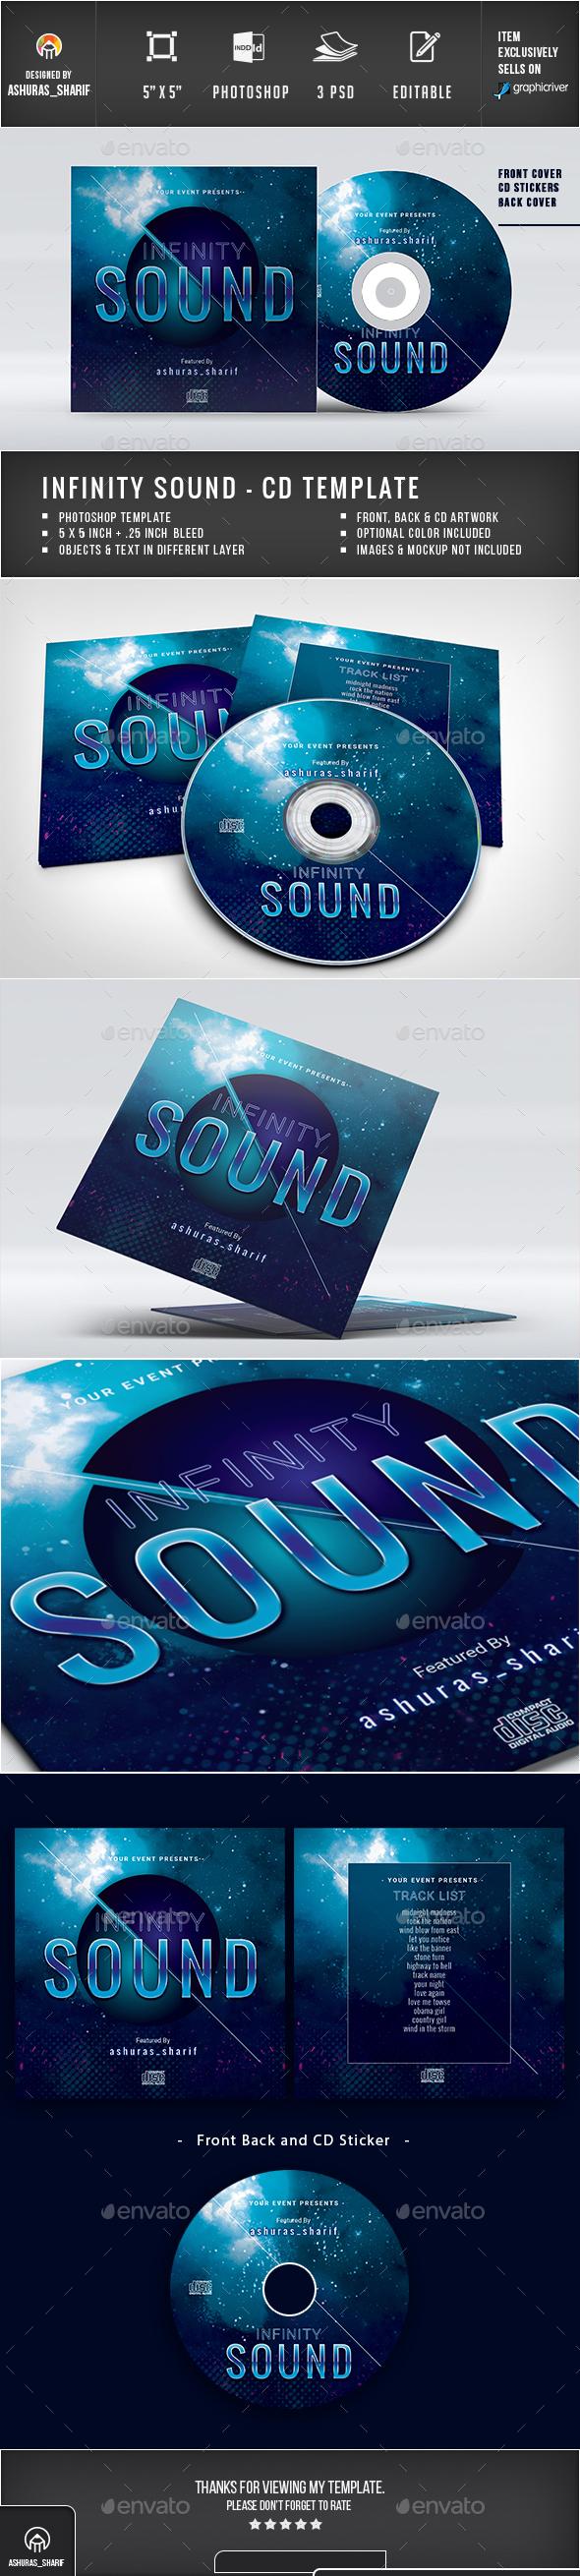 CD Cover - CD & DVD Artwork Print Templates